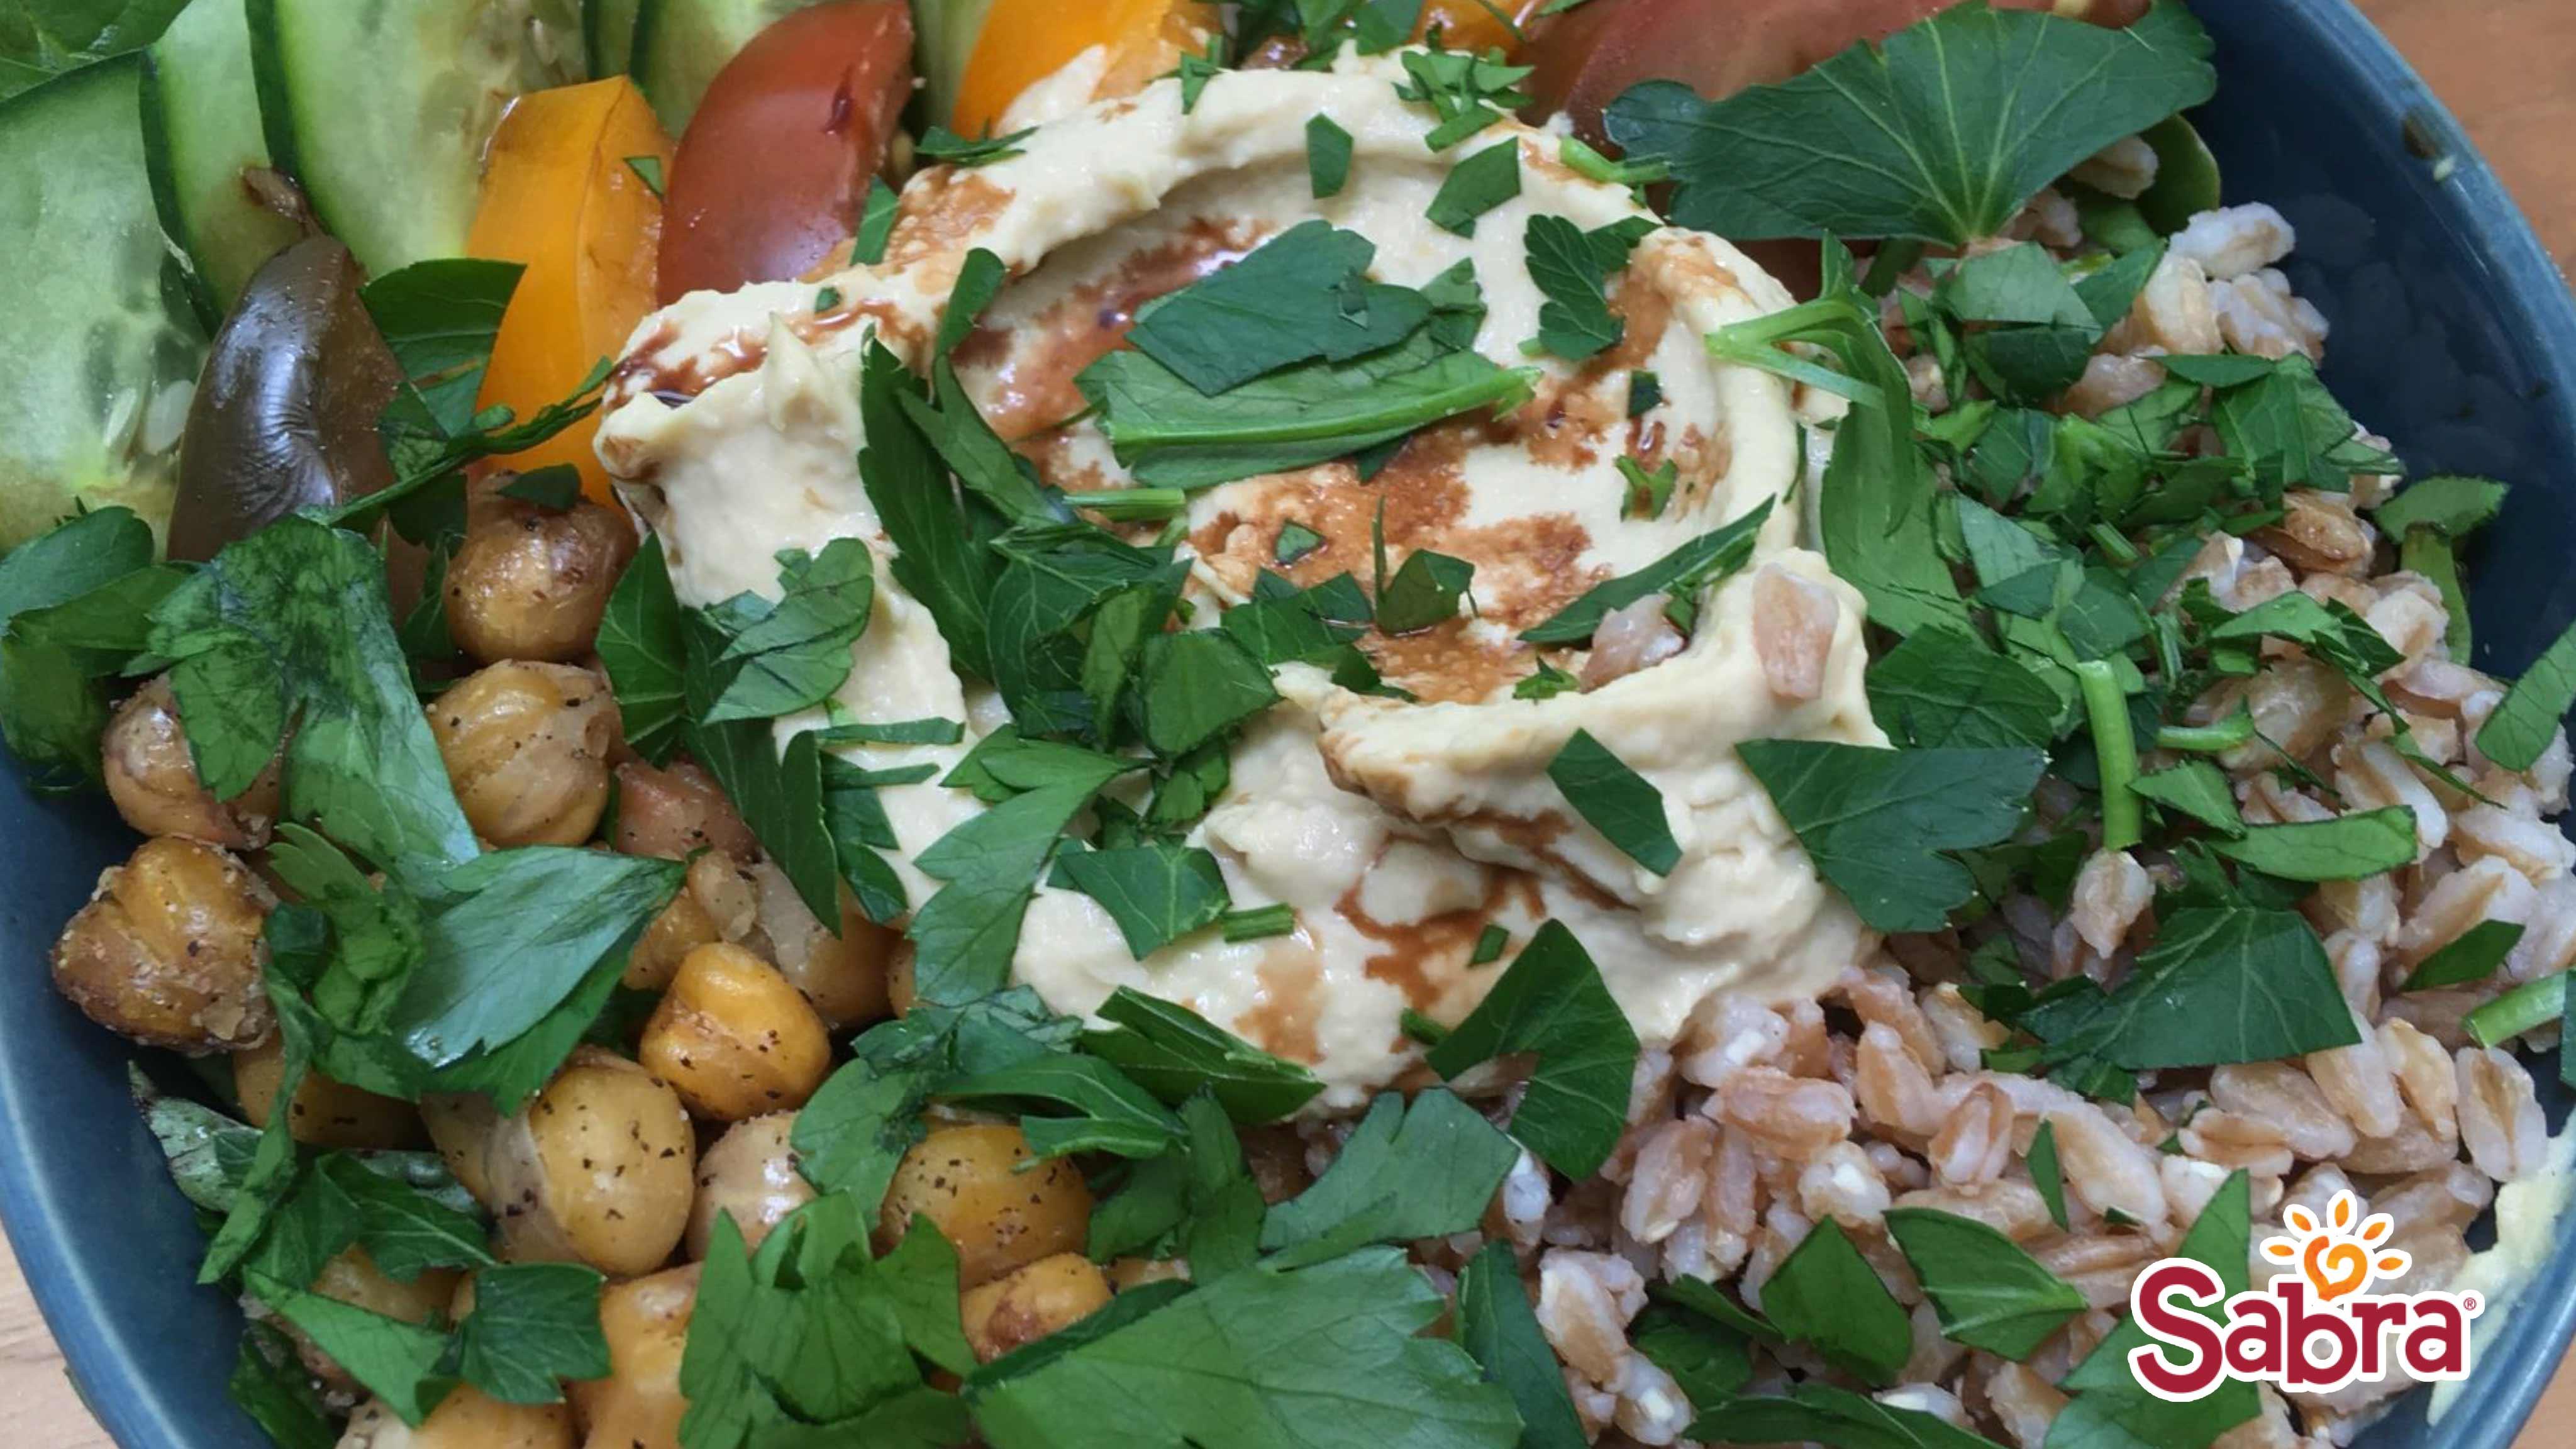 Image for Recipe Hummus Buddah Bowl